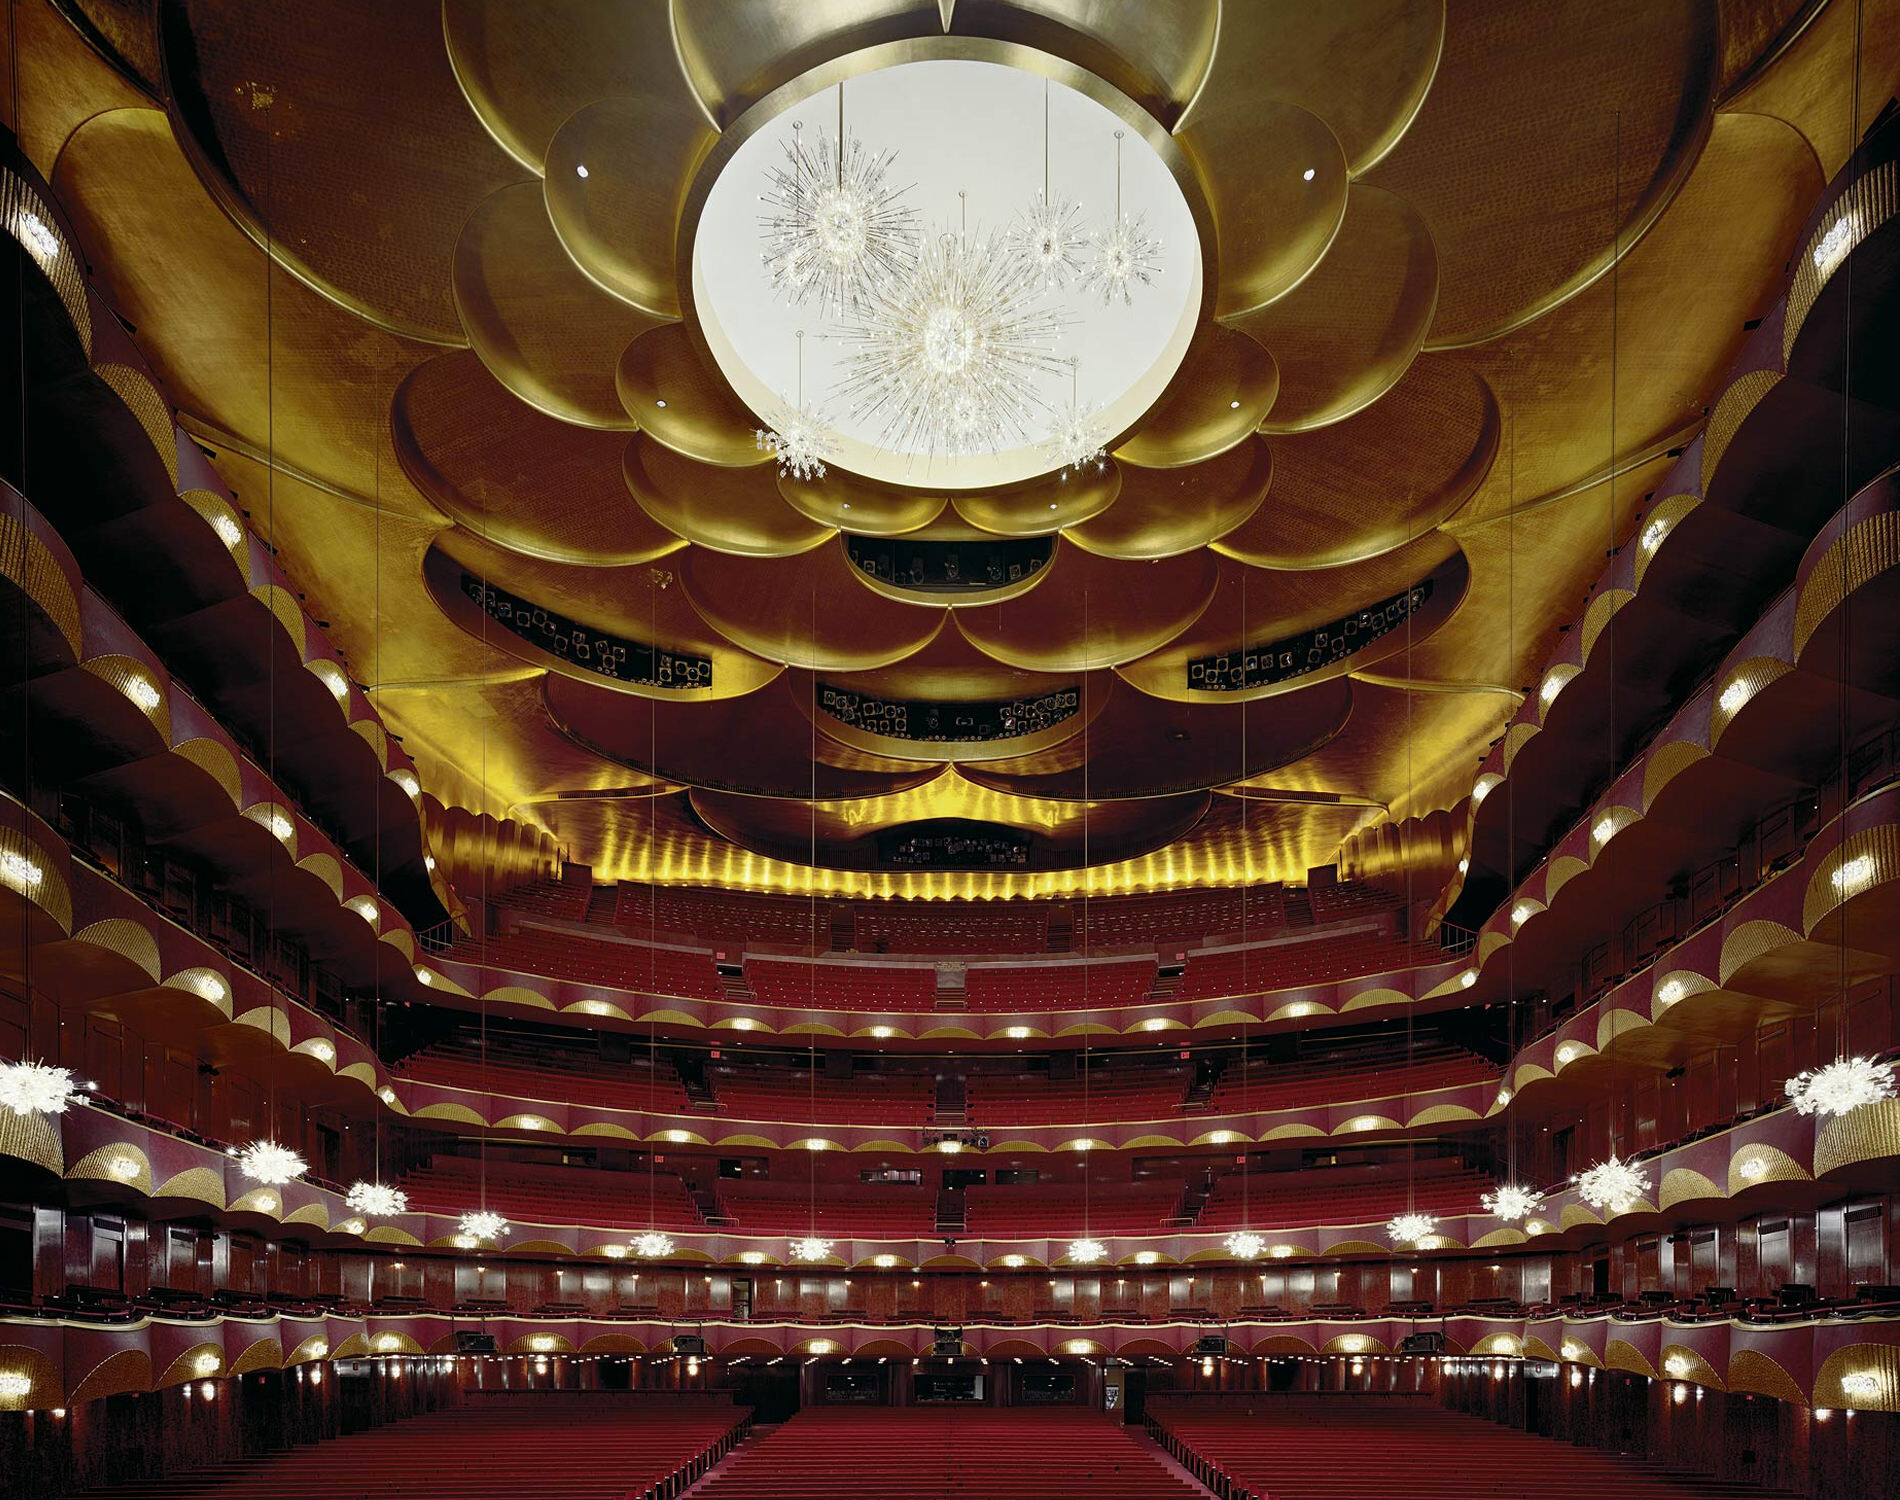 Метрополитен-опера, Нью-Йорк, 2009 год. Фотограф Дэвид Левенти